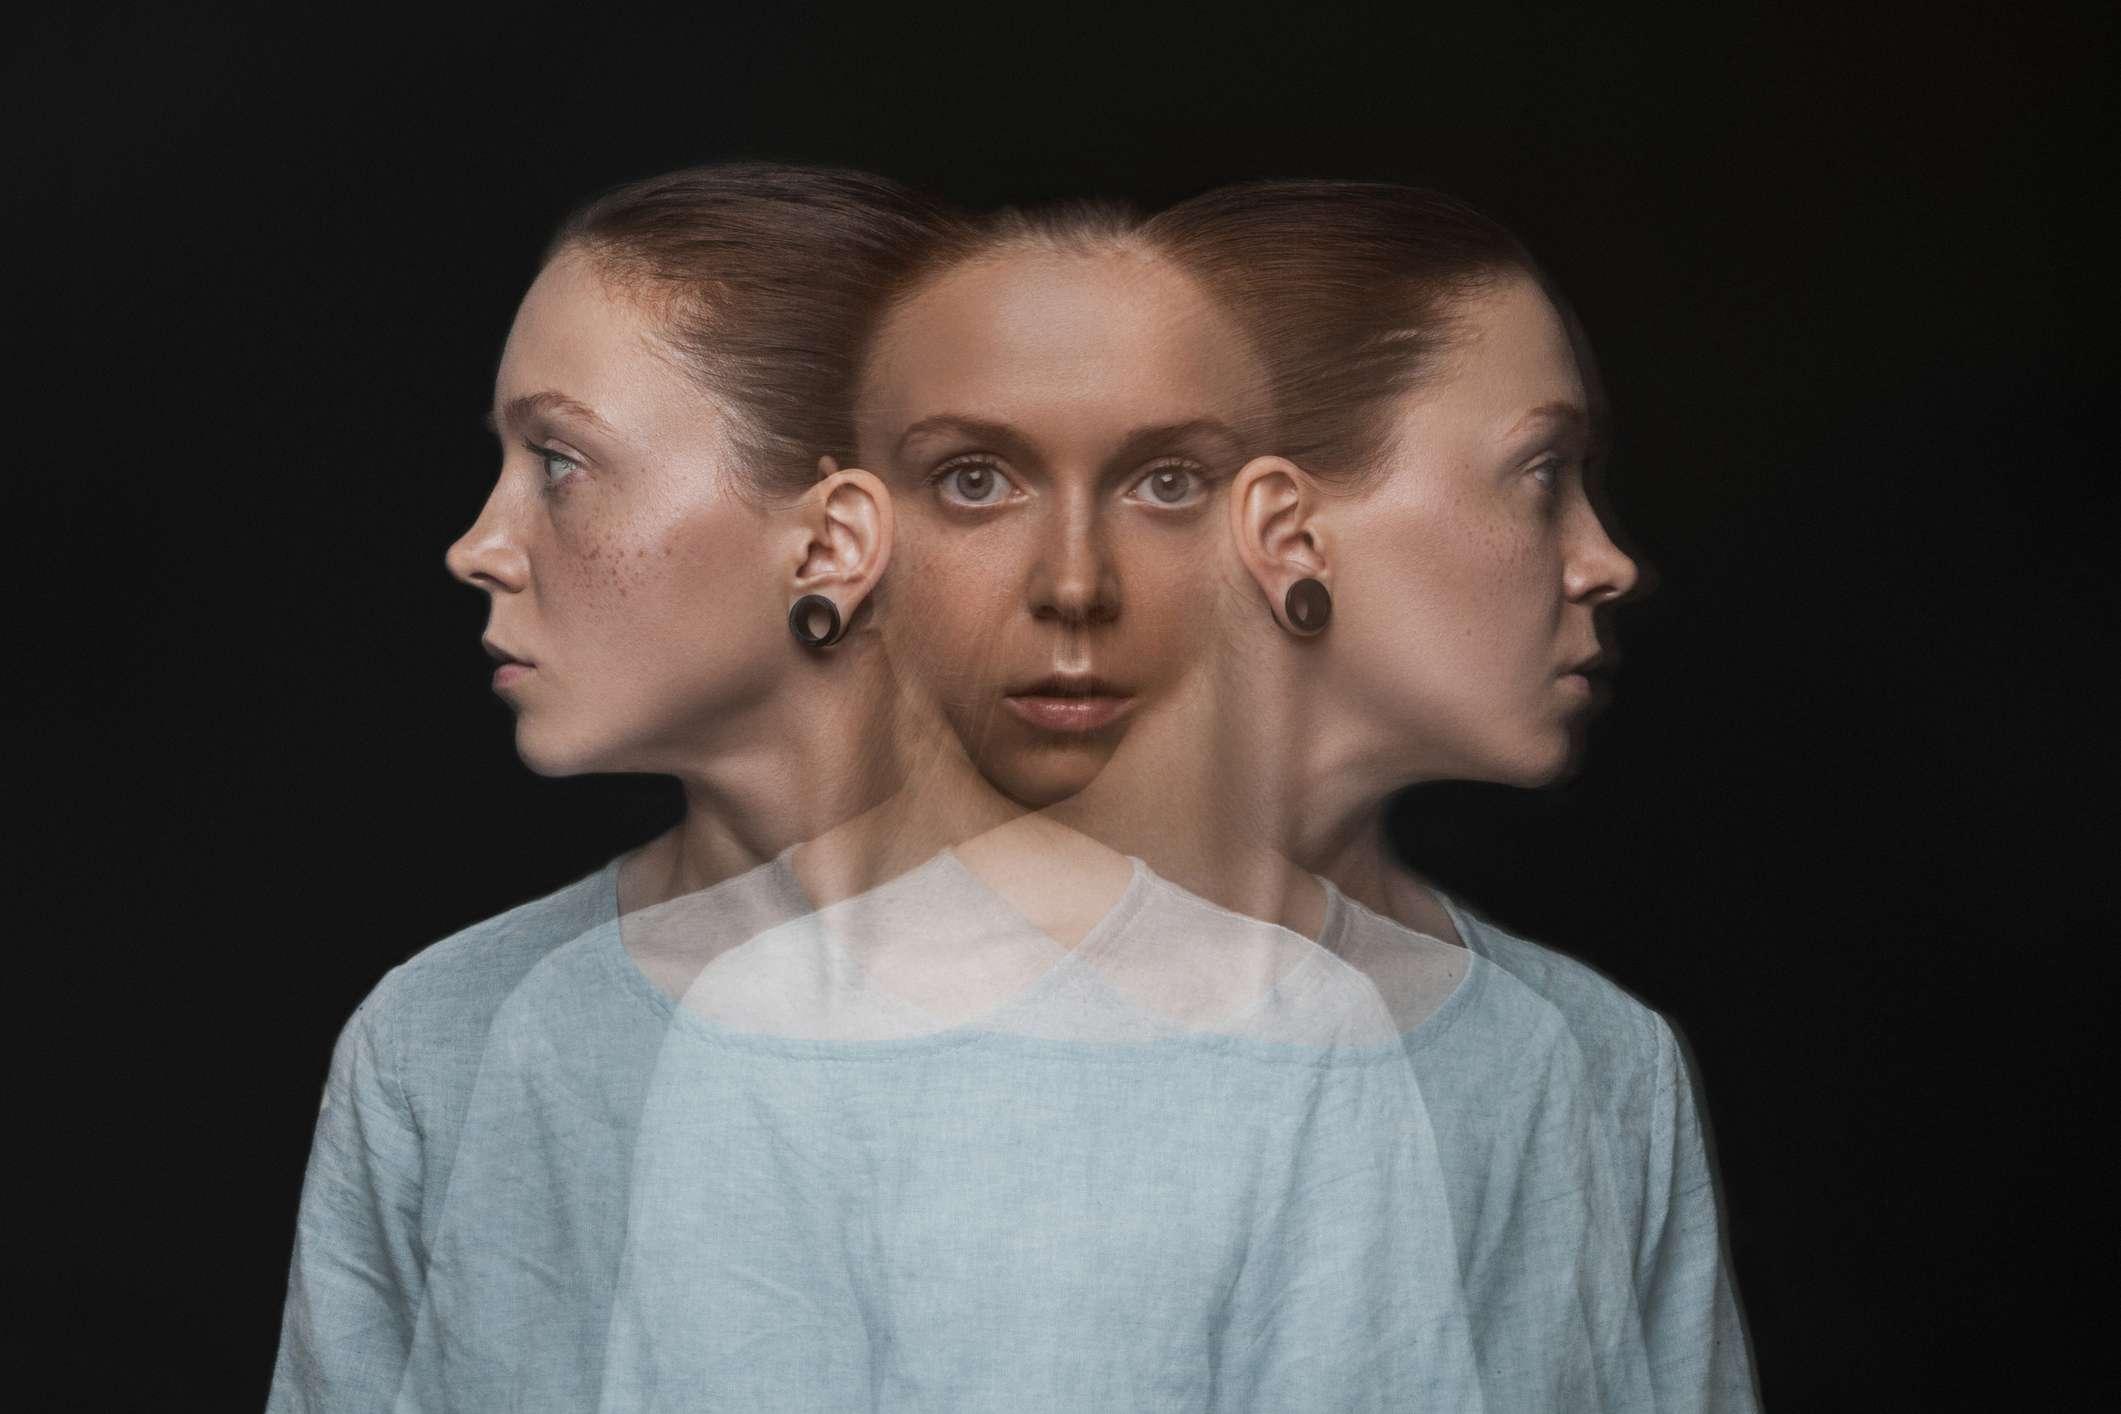 split personality disorder